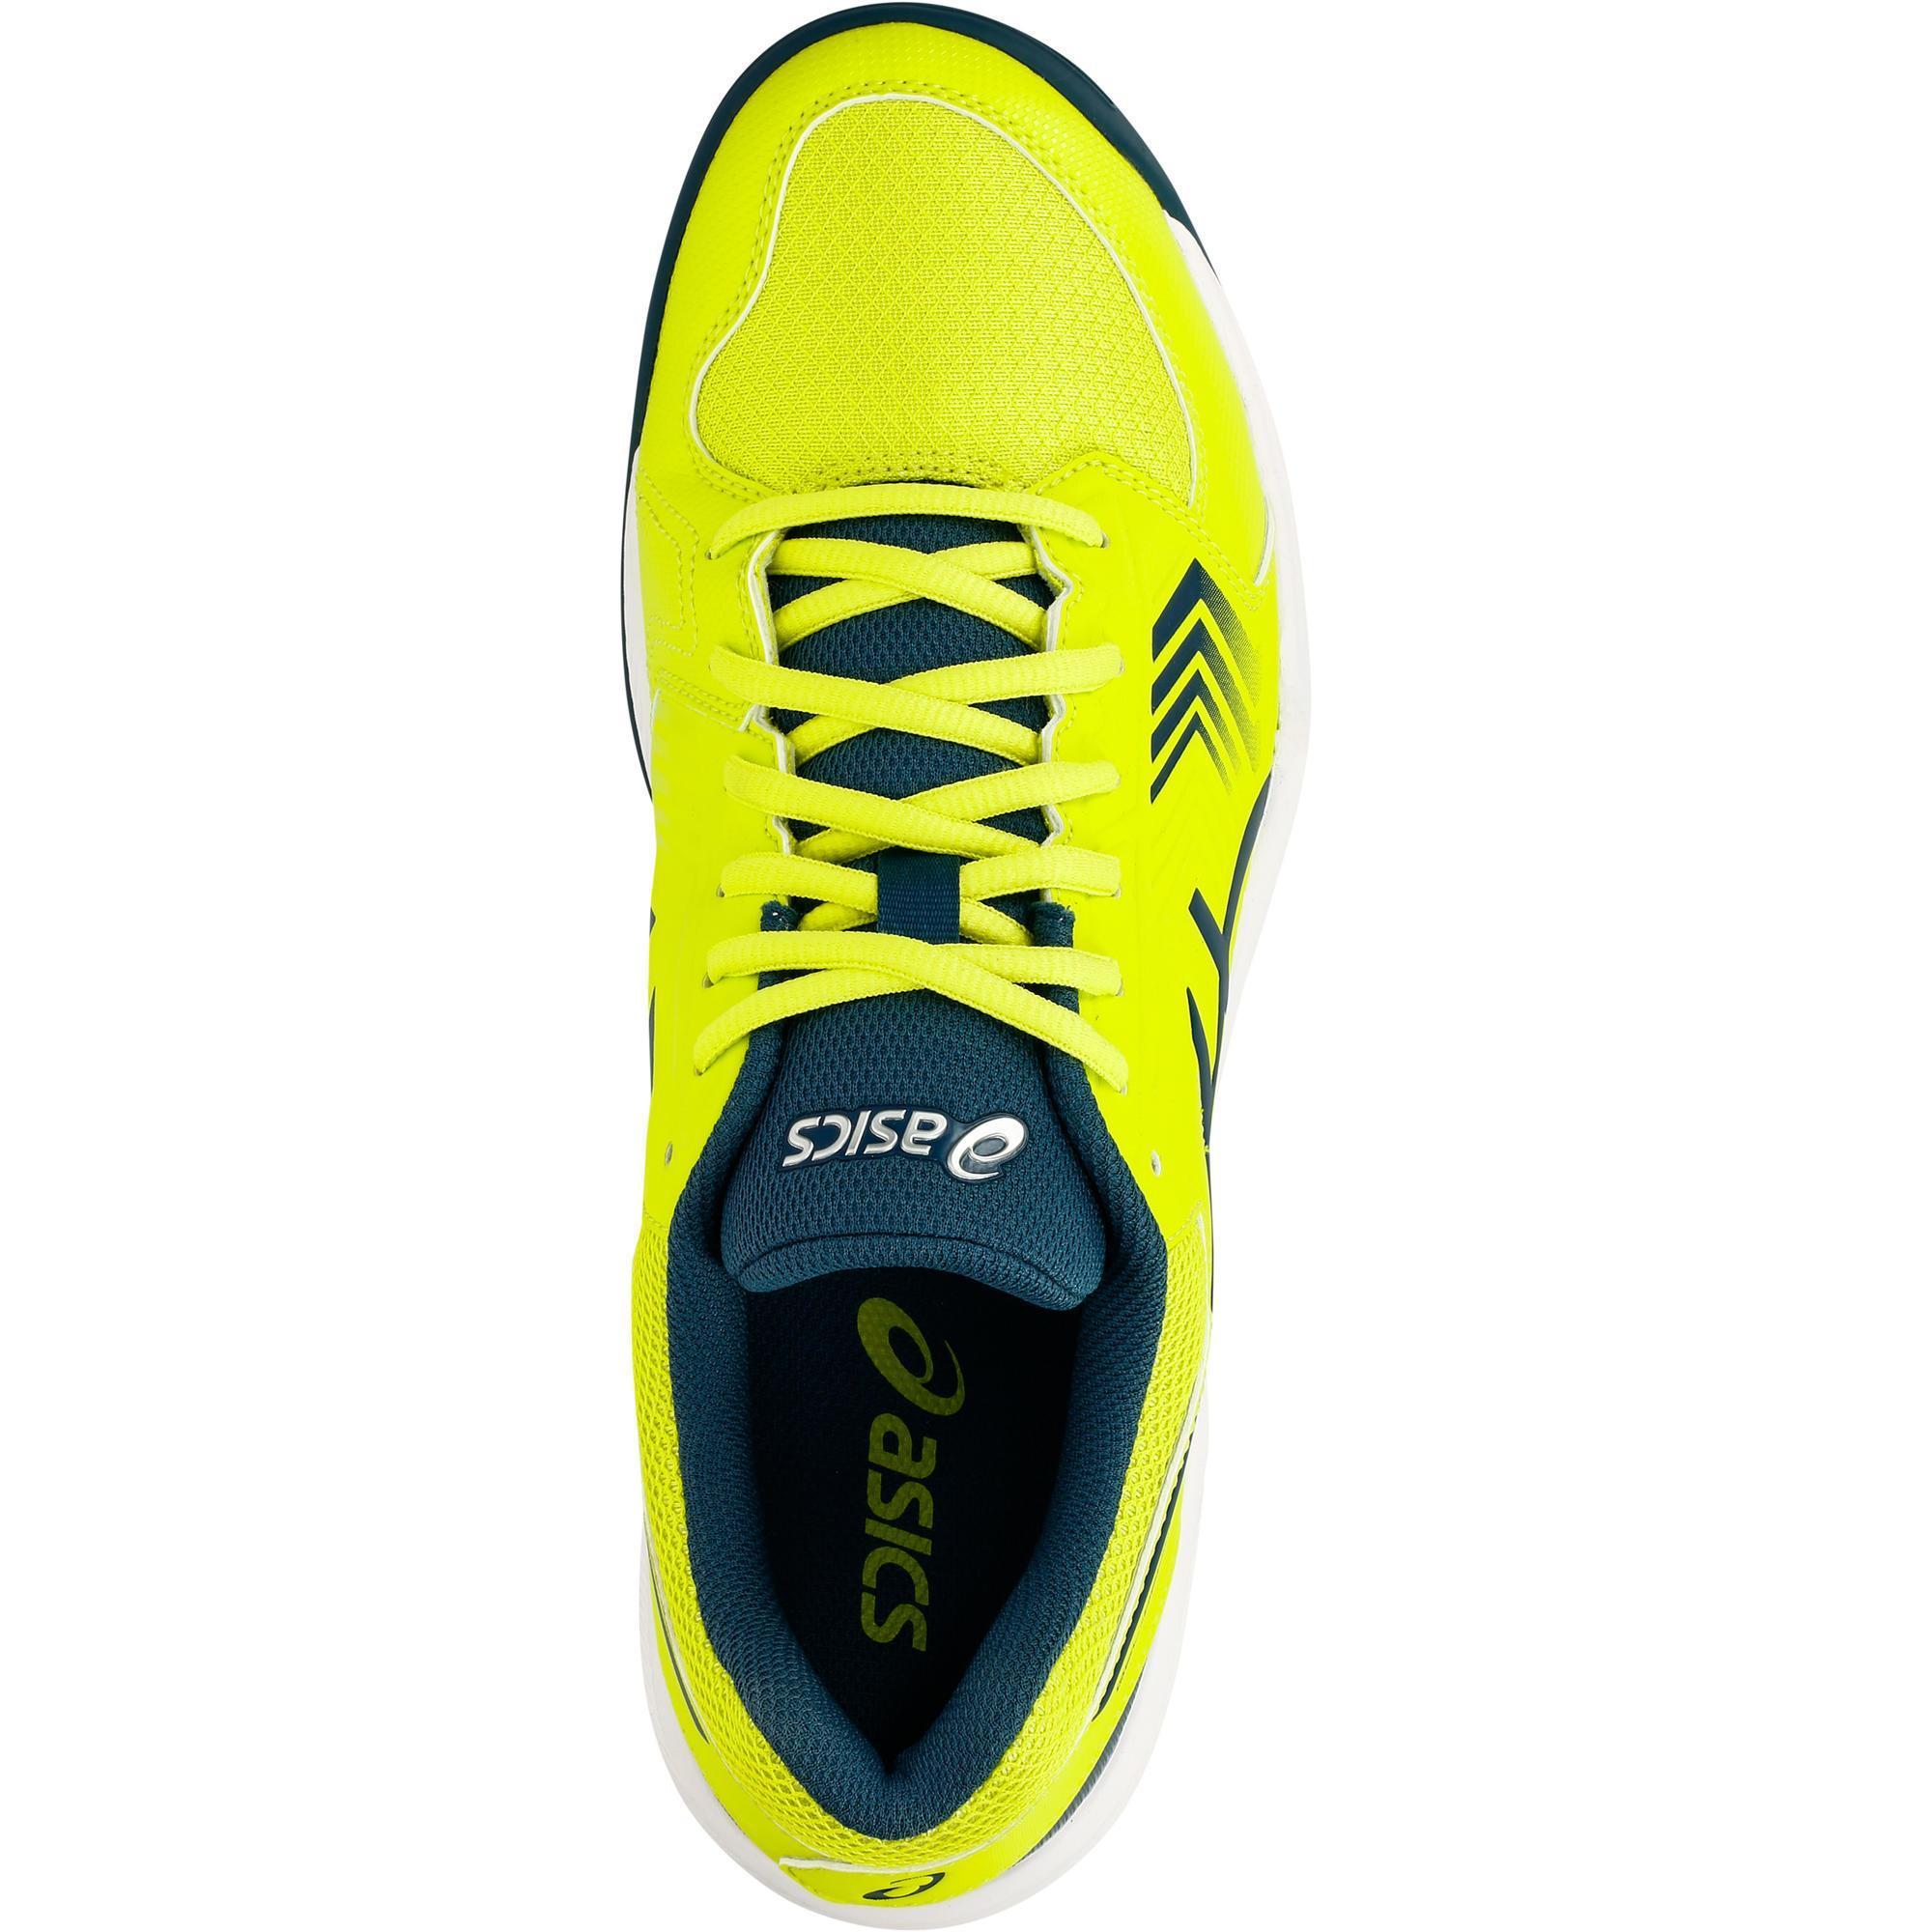 cheap for discount 10624 06476 Gel De Chaussure Tennis Dedicate Homme Zqdwpha Jaune Asics Decathlon  ZnRO5qBRz4